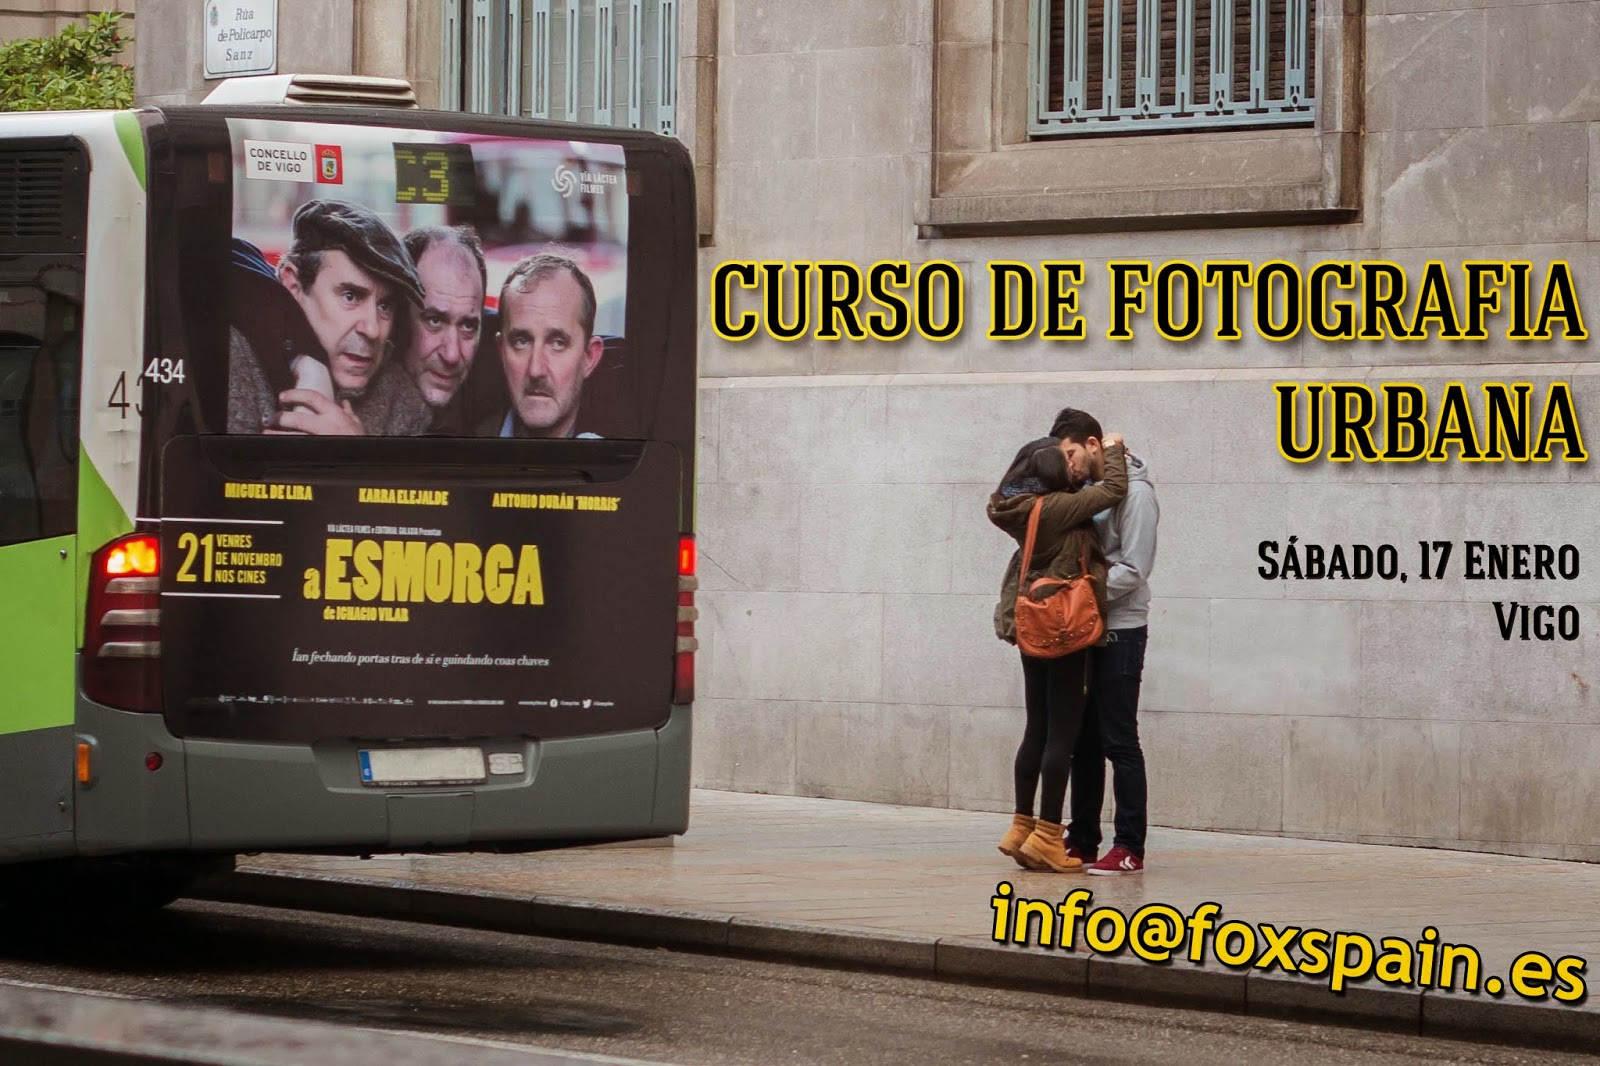 Fotografia Urbana Ene2015 1